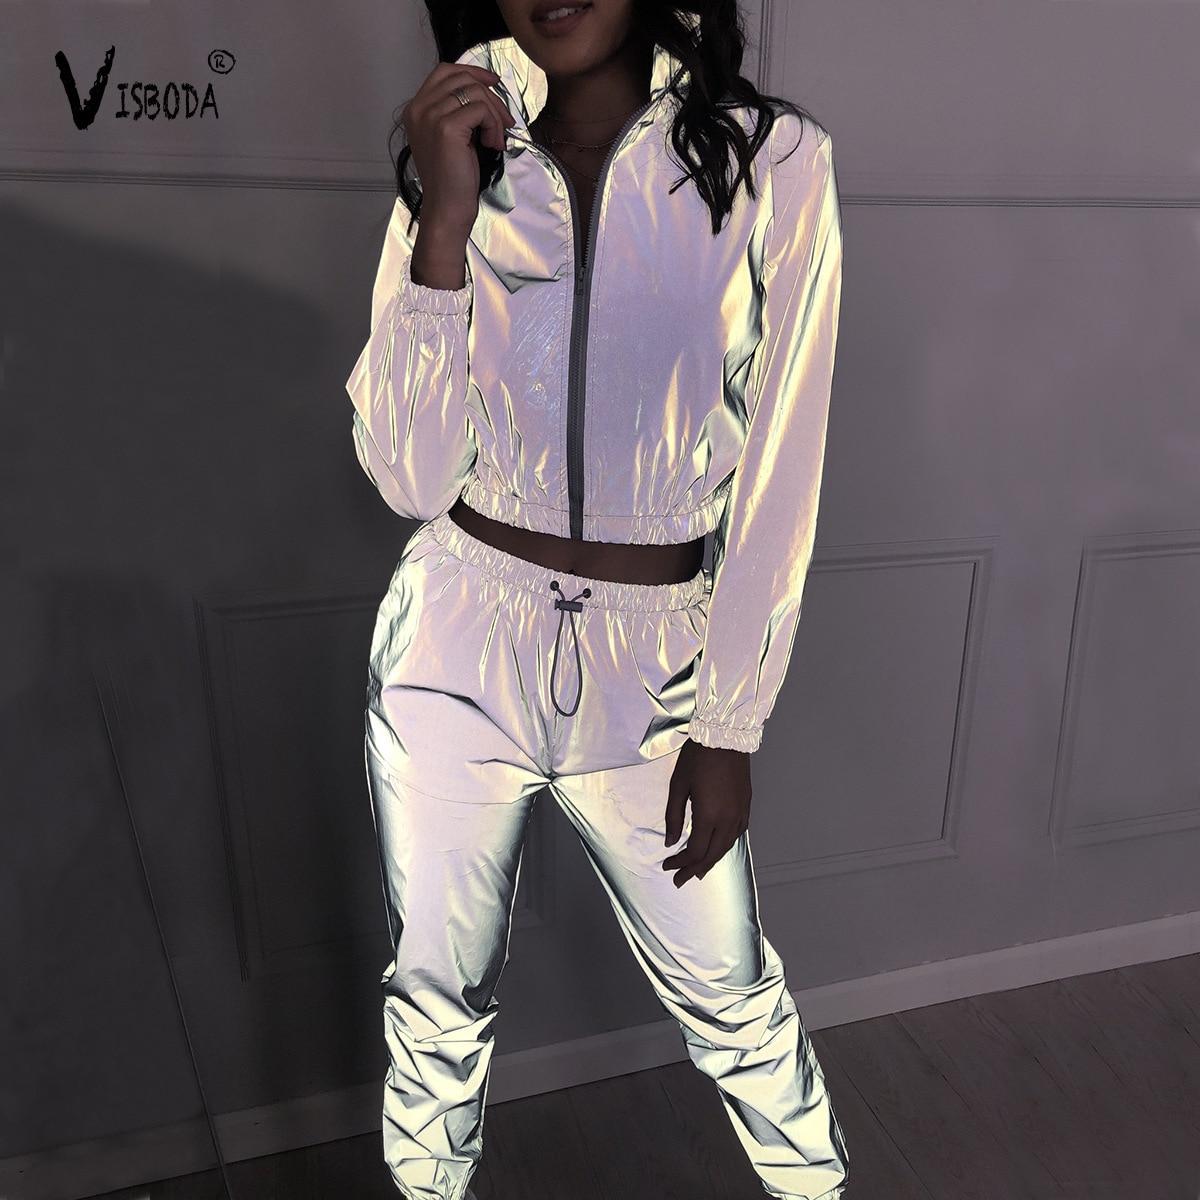 women-tracksuit-2-piece-set-windbreaker-reflective-crop-top-pants-fashion-female-loose-zipper-jacket-coat-lounge-sets-plus-size